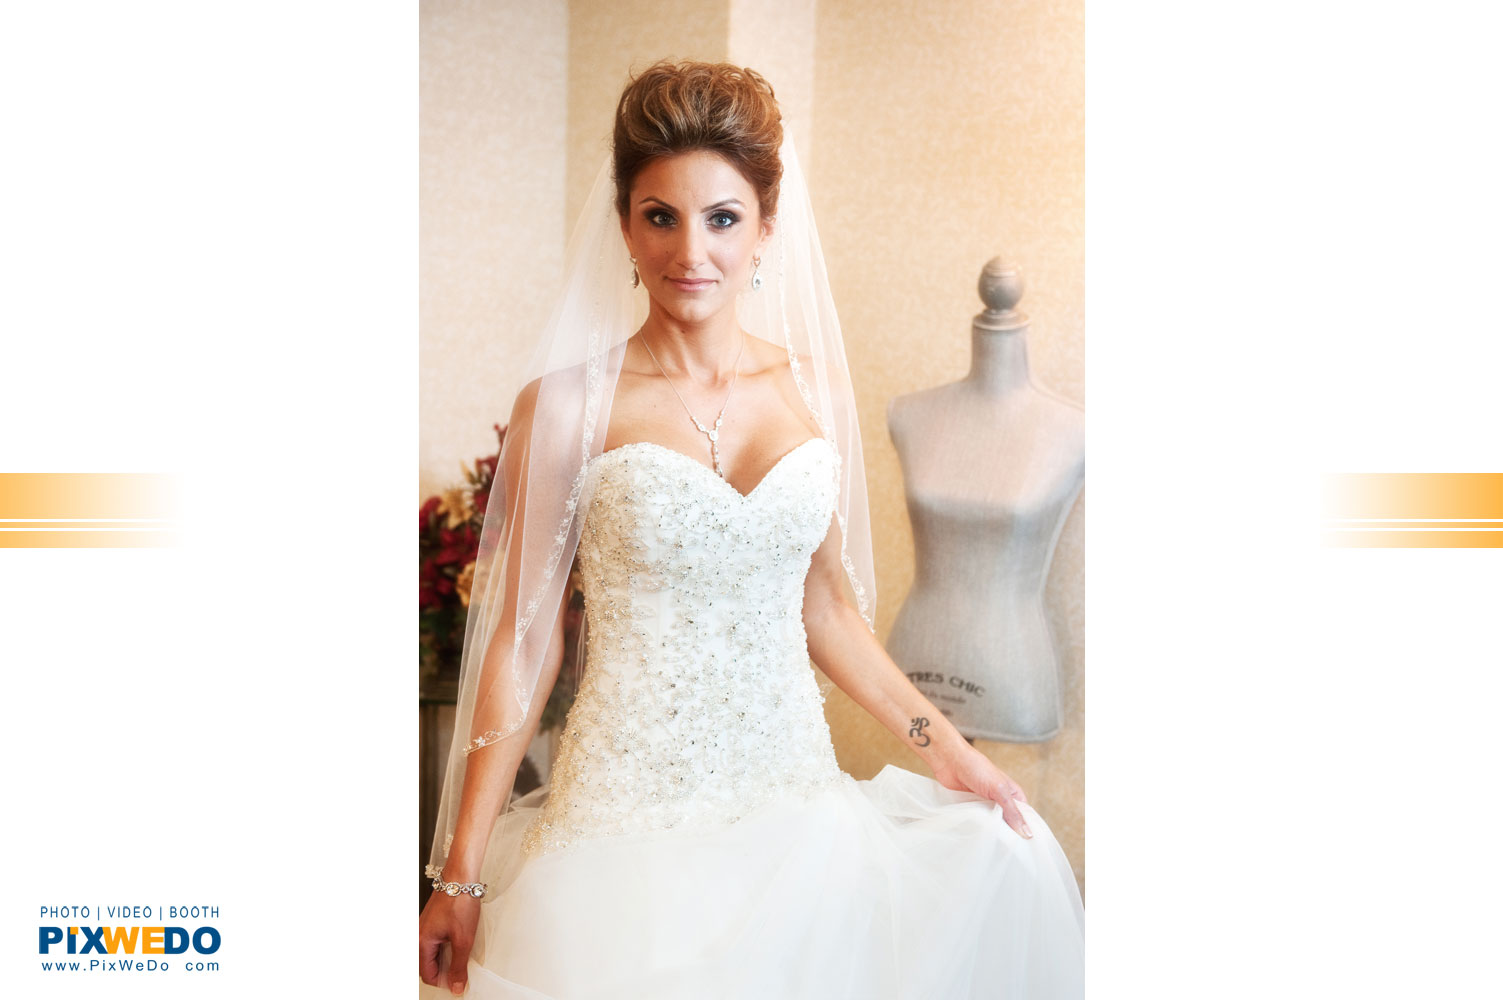 Bride in the dress, wedding